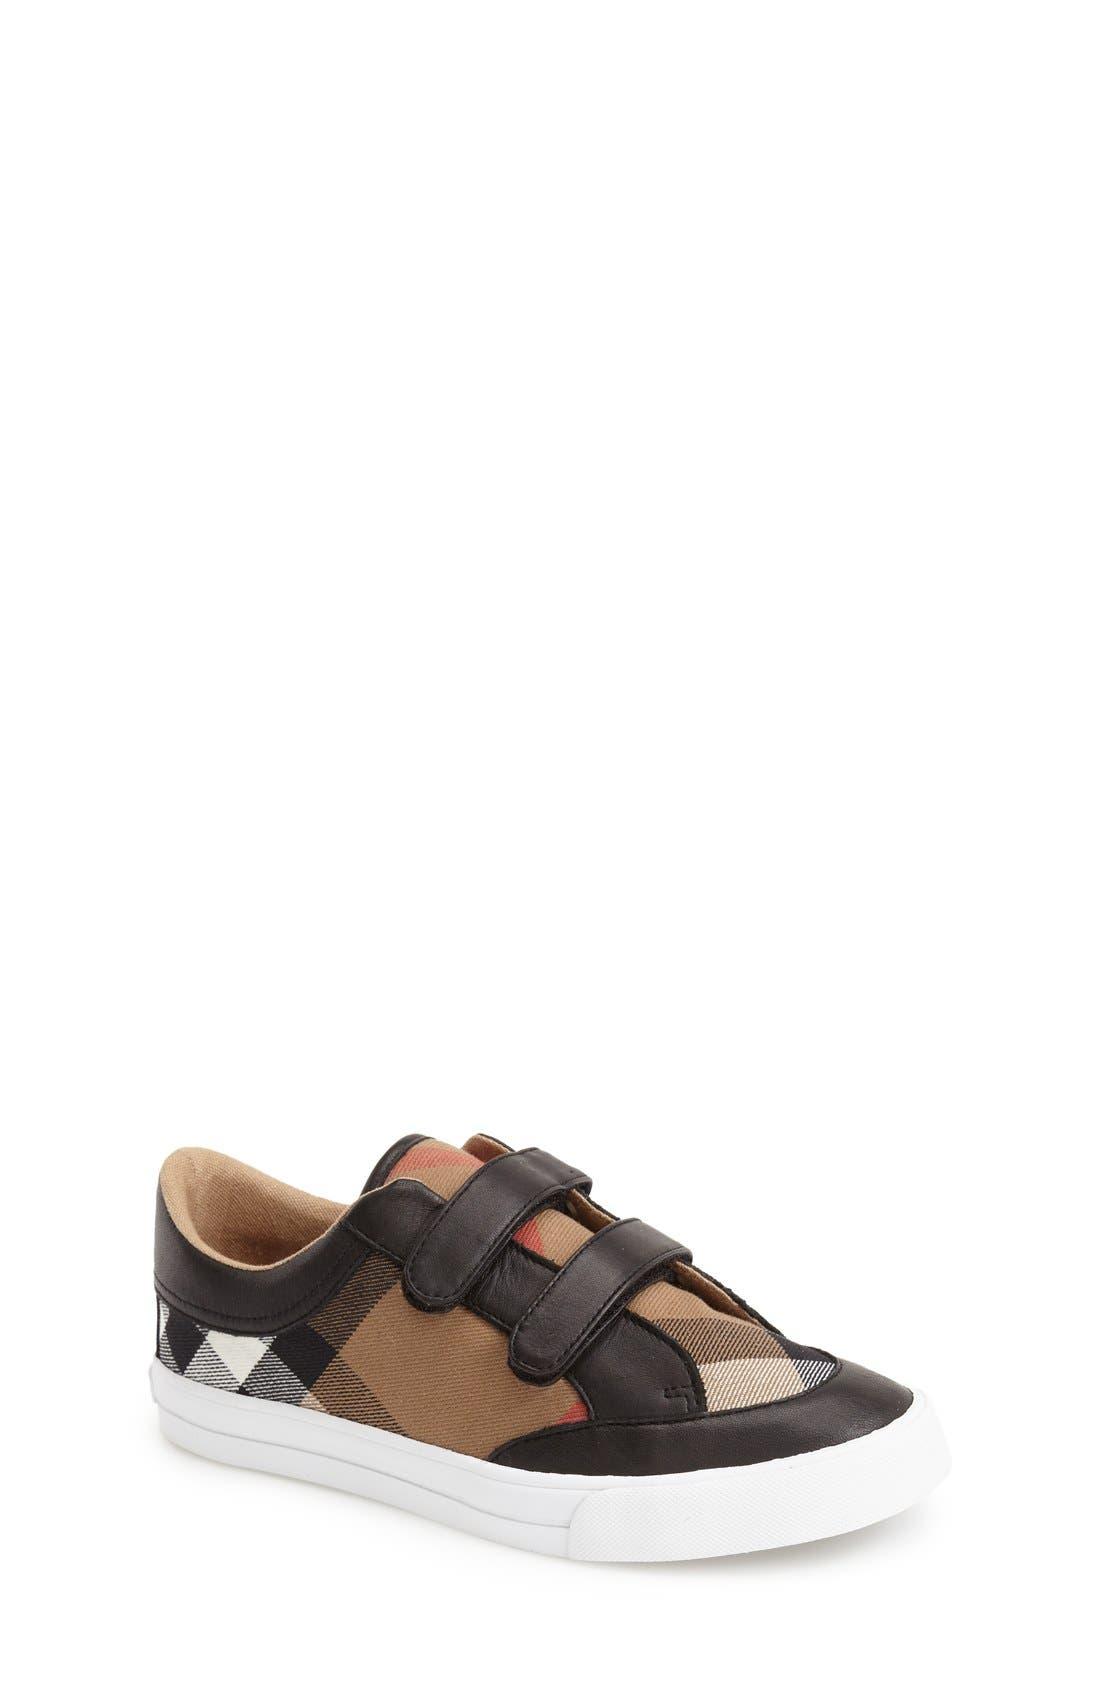 BURBERRY,                             Mini Heacham Sneaker,                             Main thumbnail 1, color,                             001